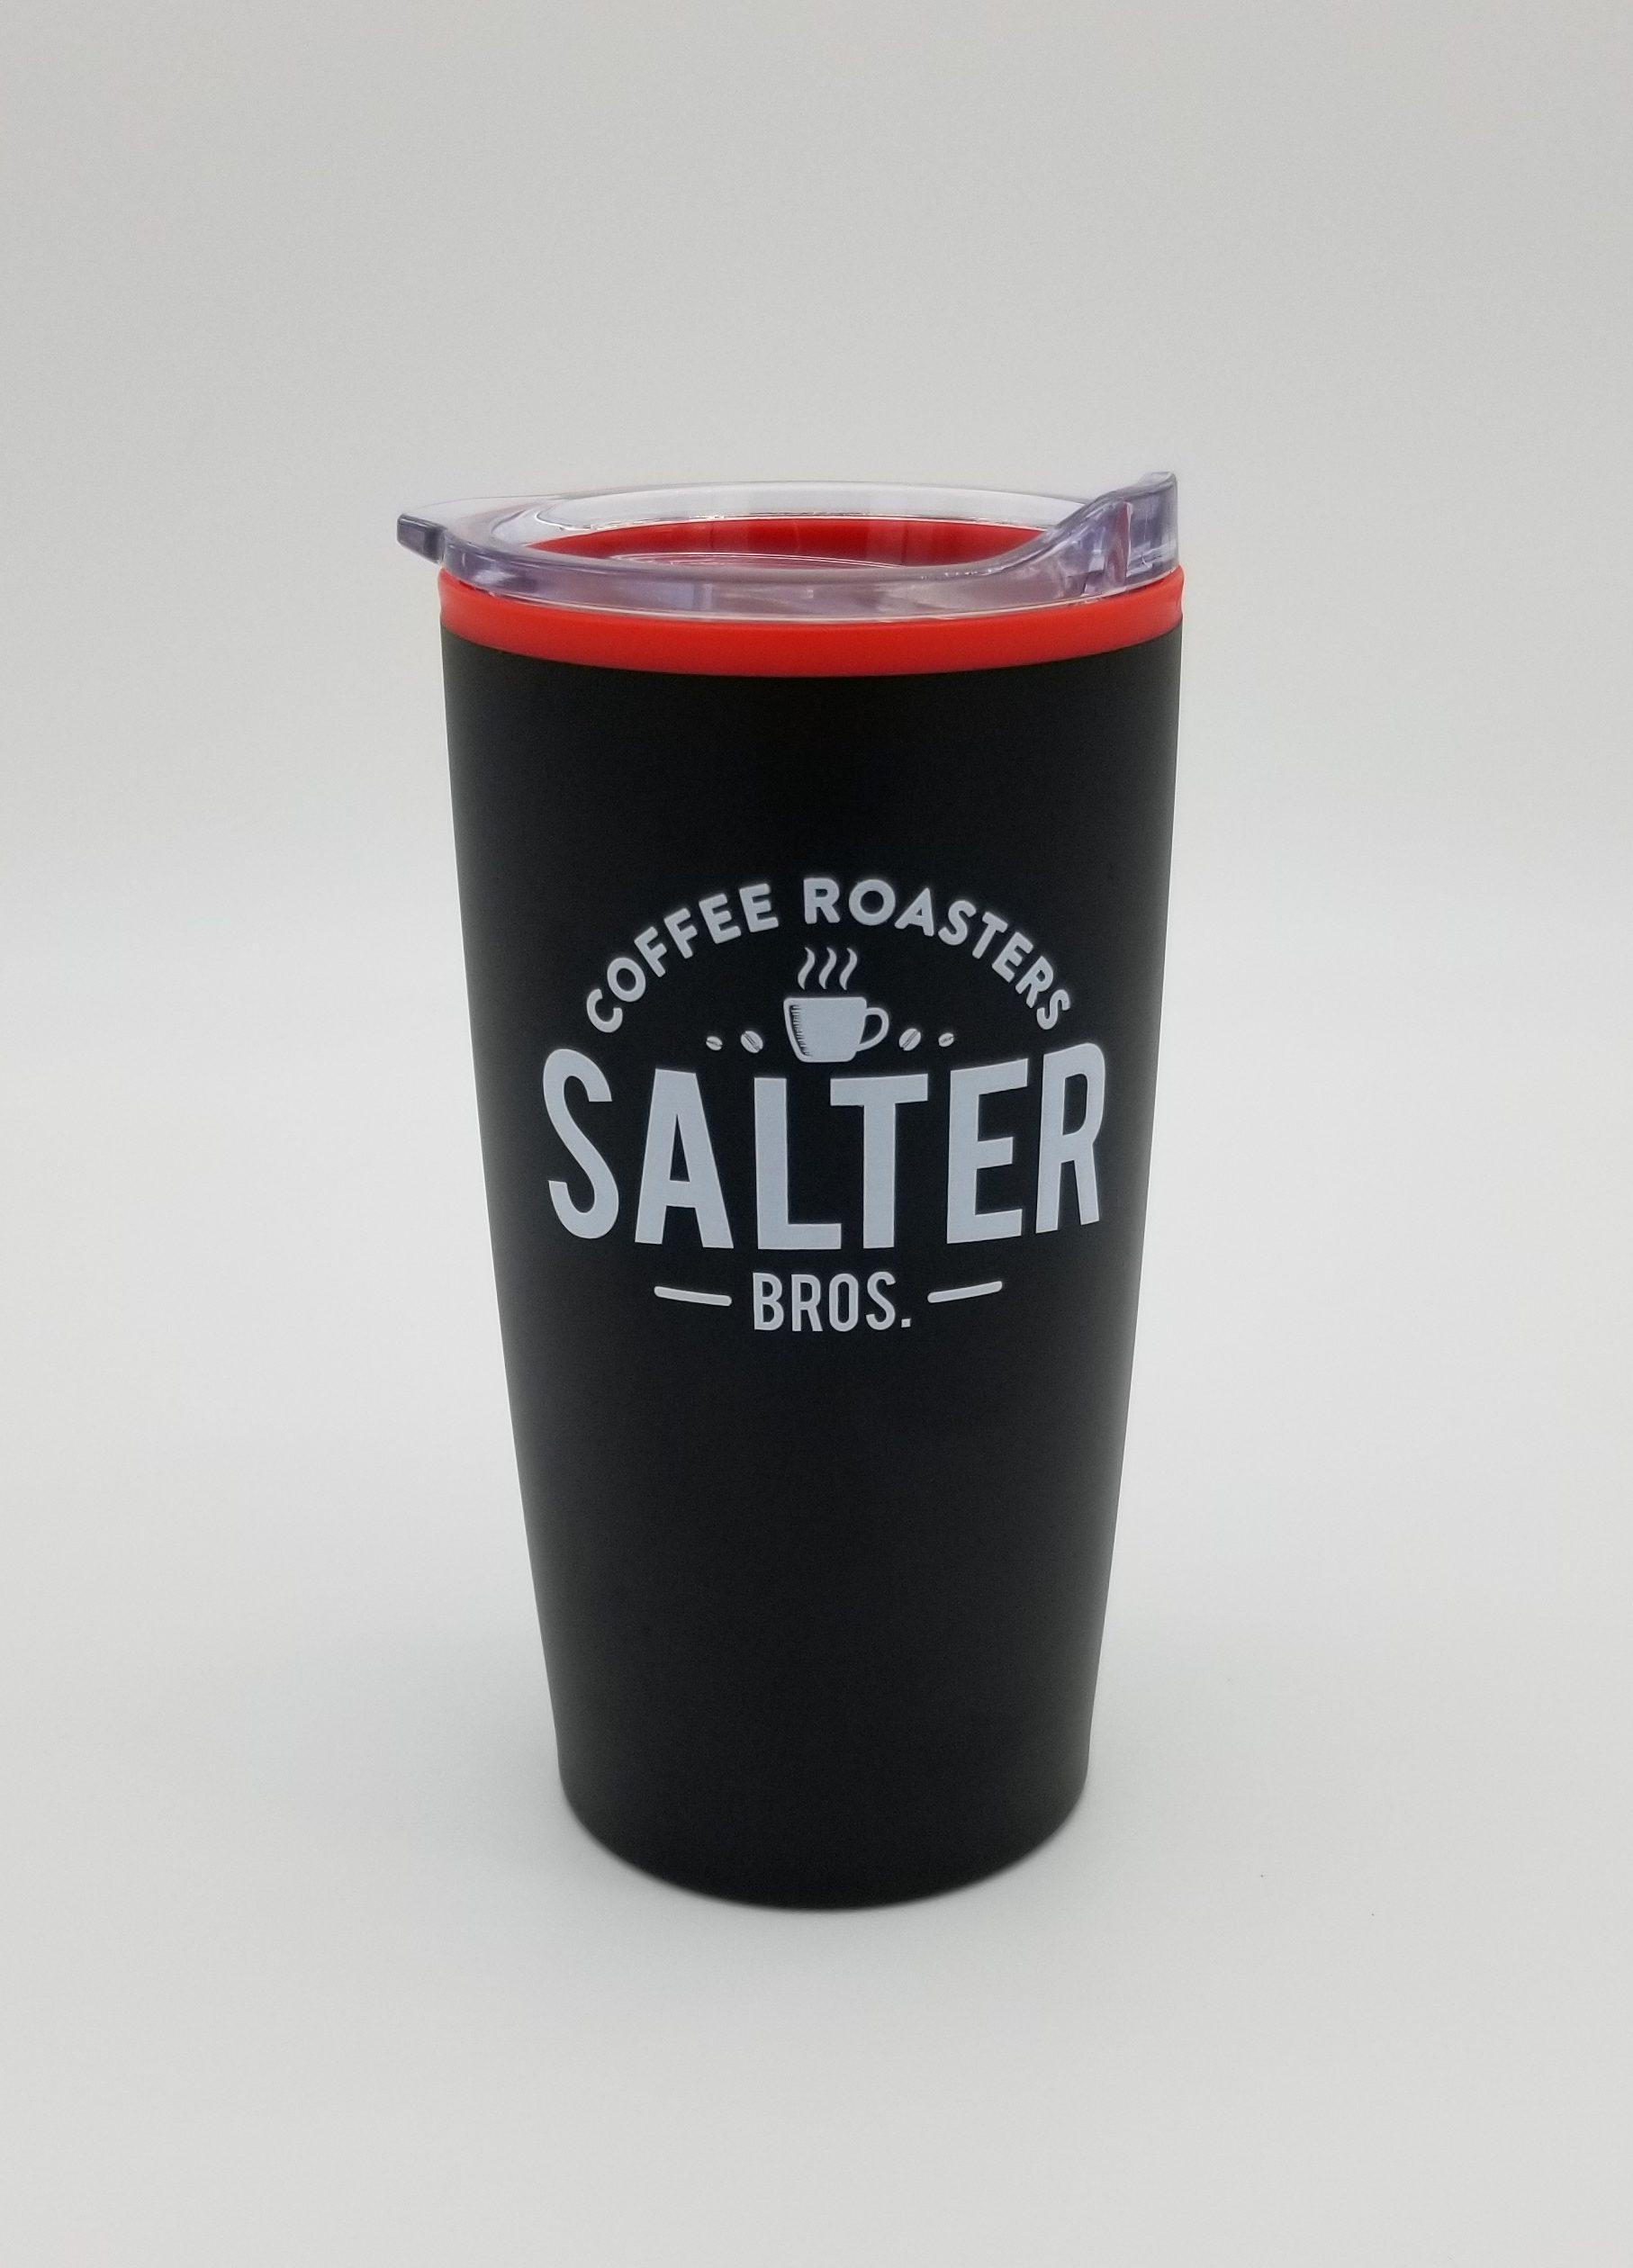 Salter bros yeti cup